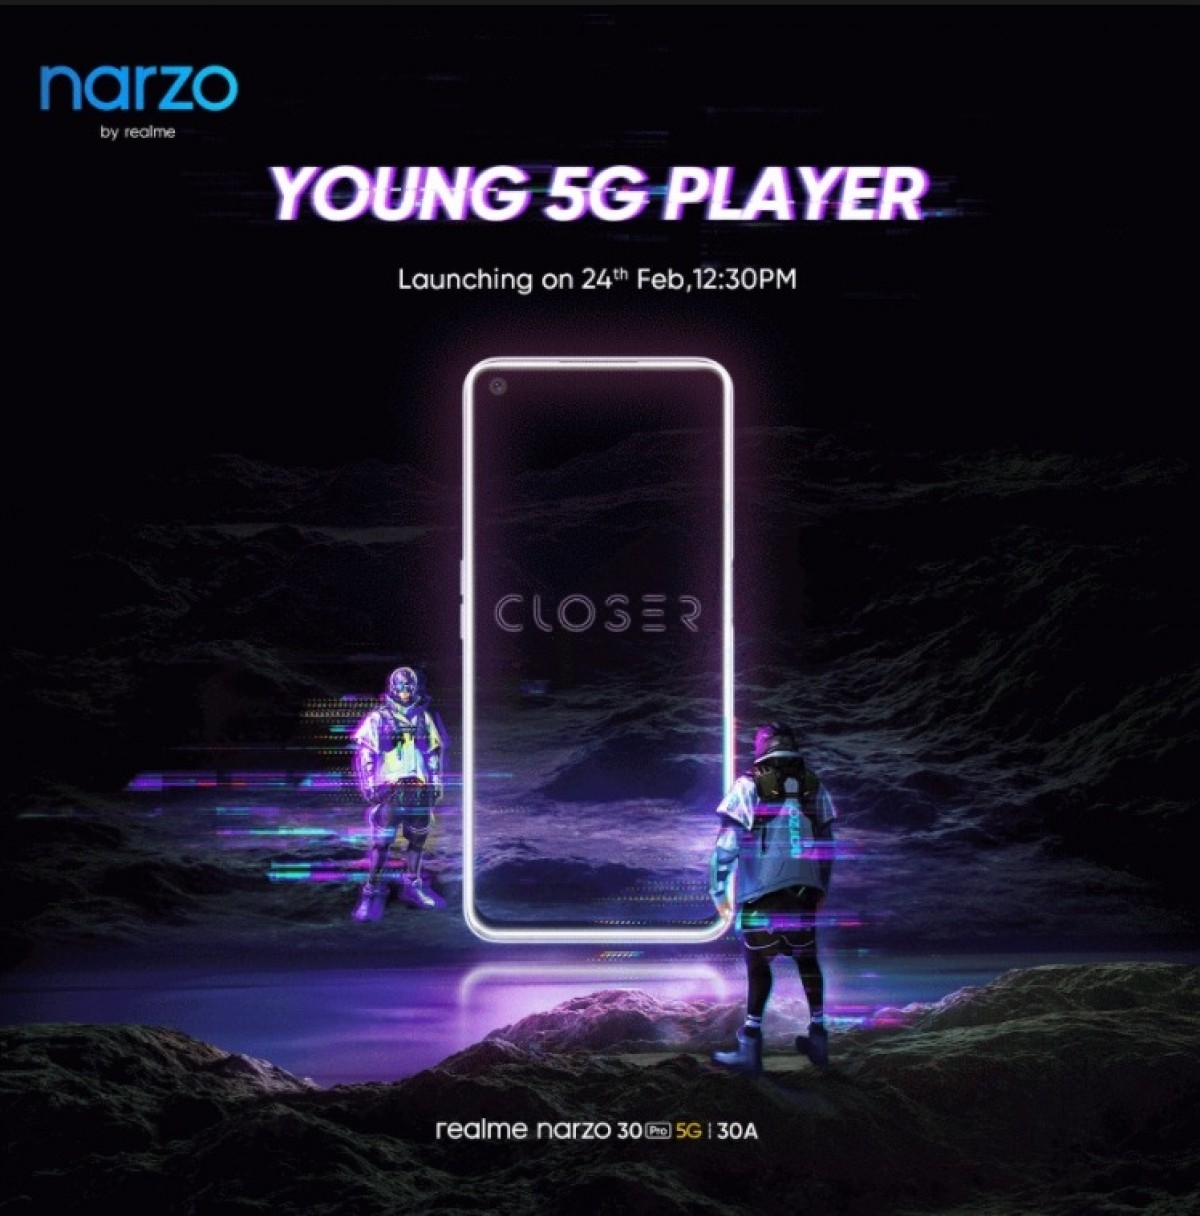 Realme Narzo 30A, Narzo 30 Pro 5G, Buds Air 2 officially coming on Feb 24